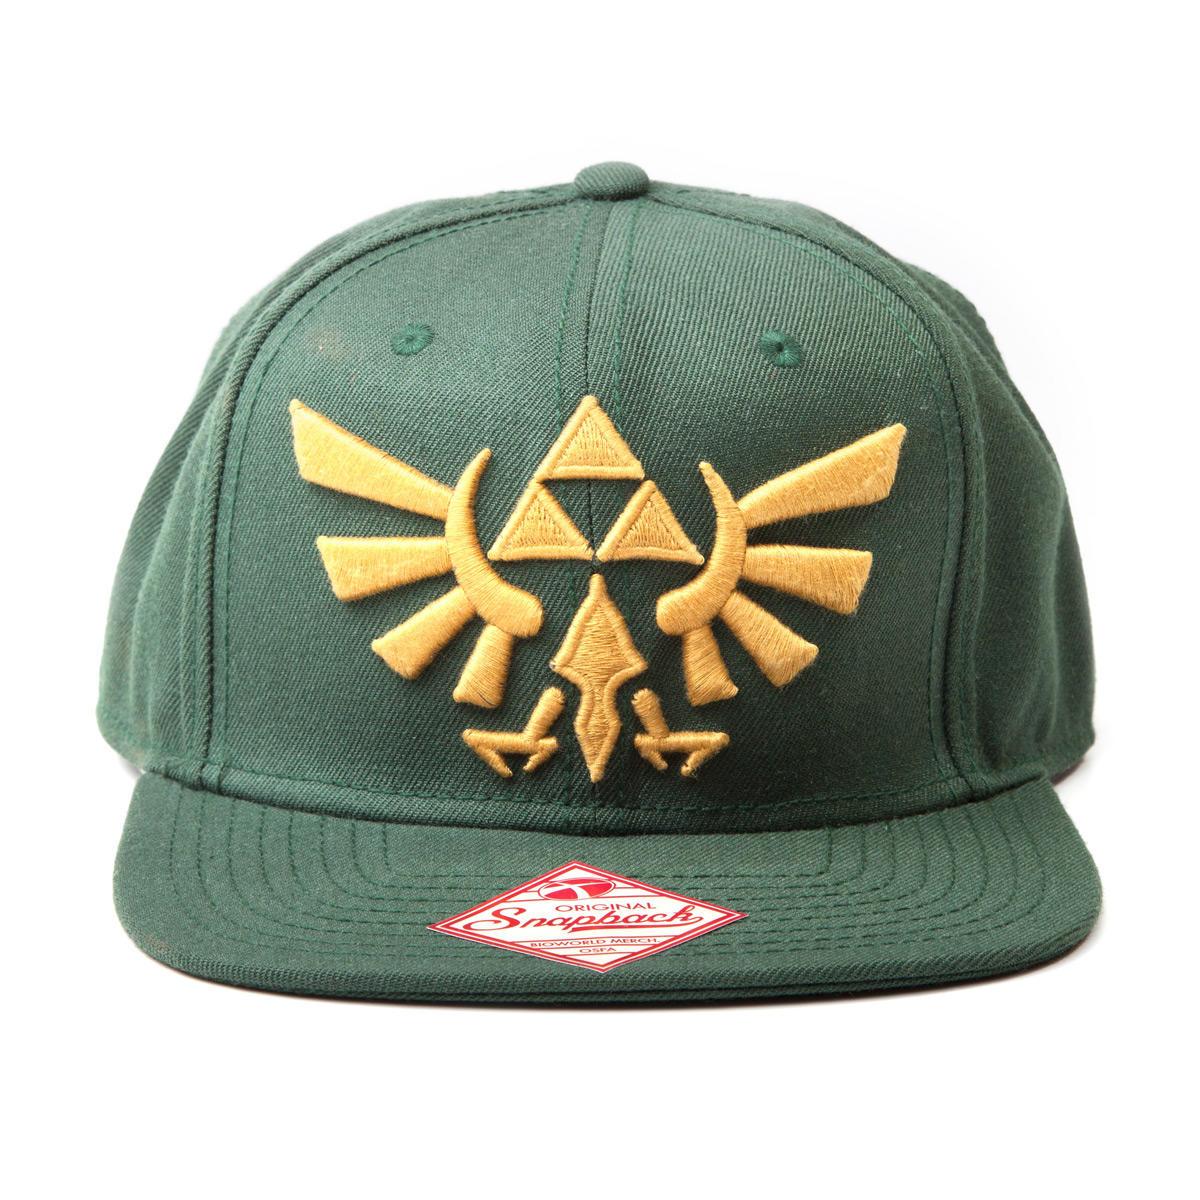 Difuzed Zelda Triforce Gold logo snapback